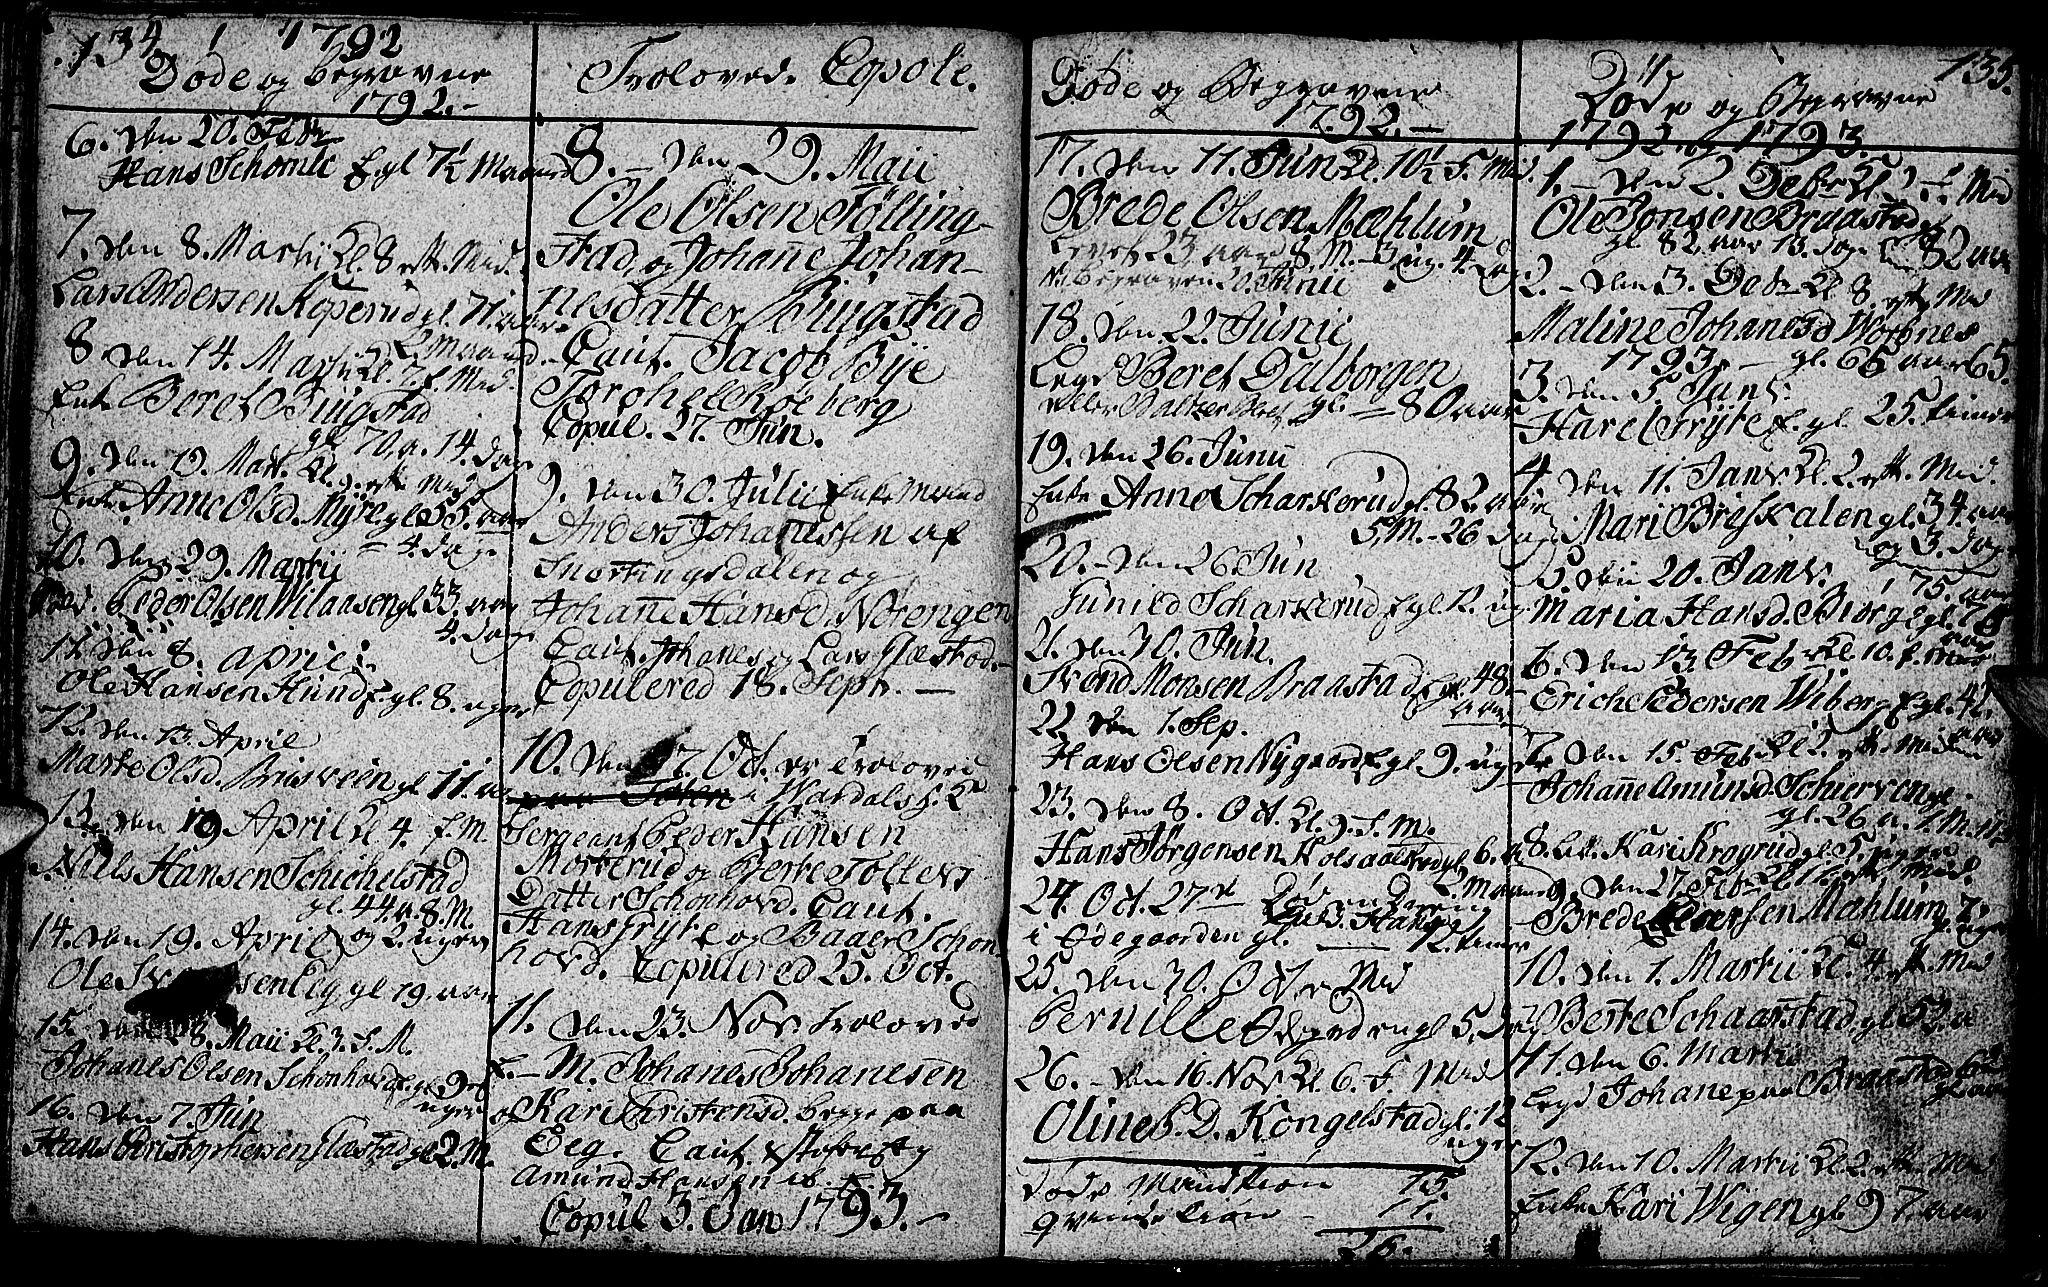 SAH, Vardal prestekontor, H/Ha/Hab/L0002: Klokkerbok nr. 2, 1790-1803, s. 134-135